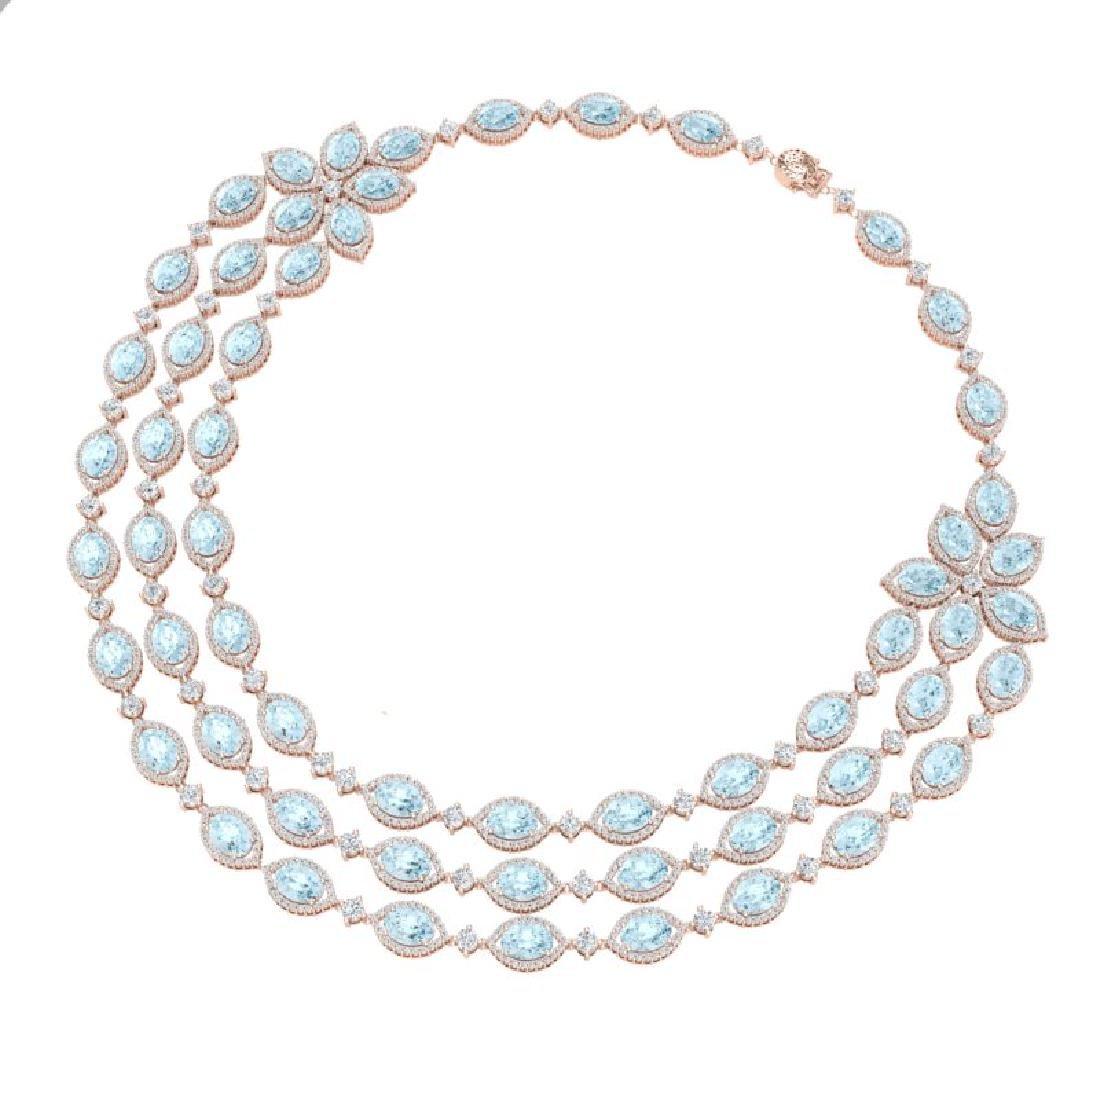 84.57 CTW Royalty Sky Topaz & VS Diamond Necklace 18K - 3